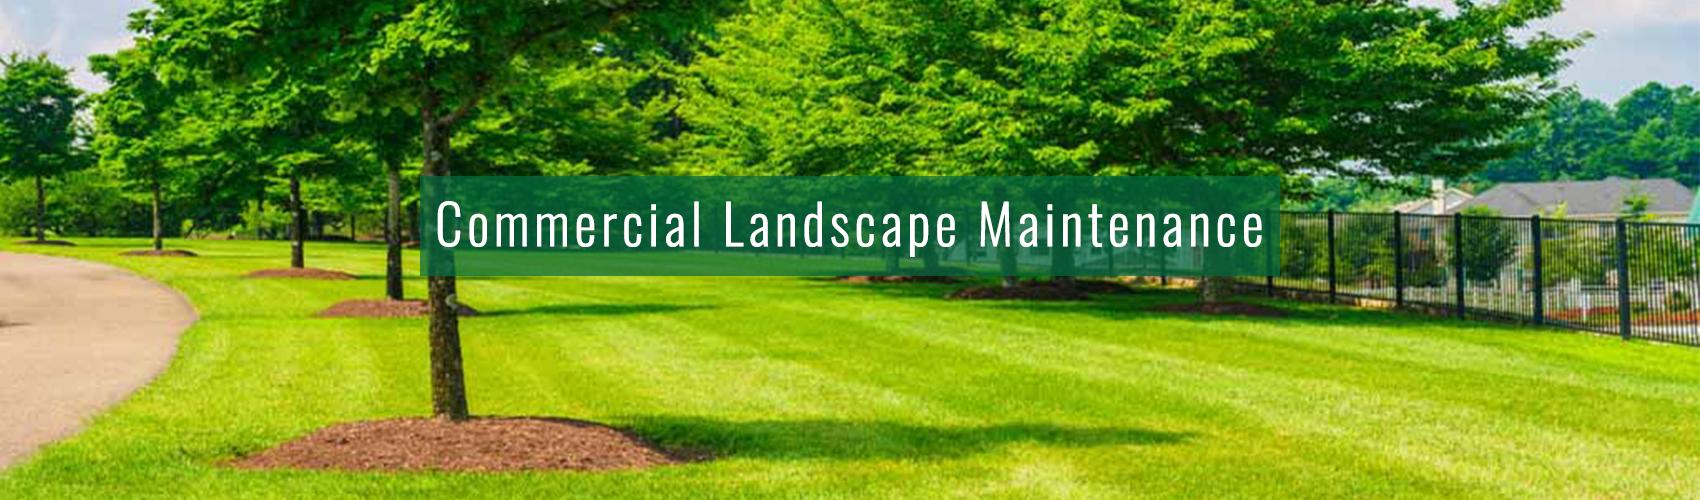 Commercial Landscape Maintenance Complete Landscaping Service